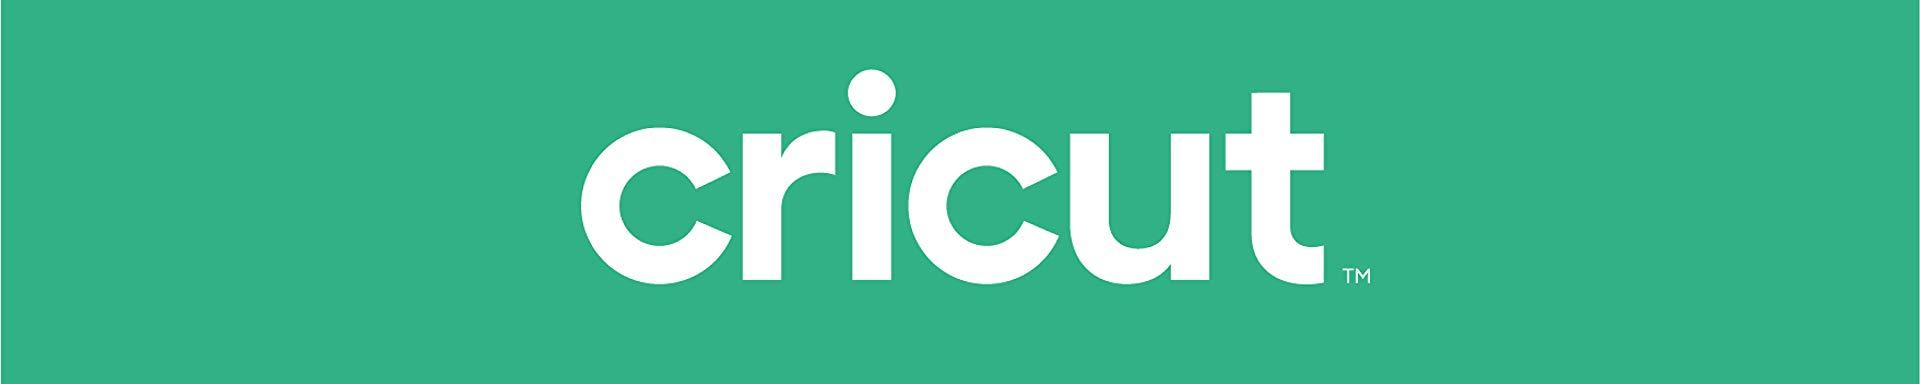 Amazon.com: Cricut